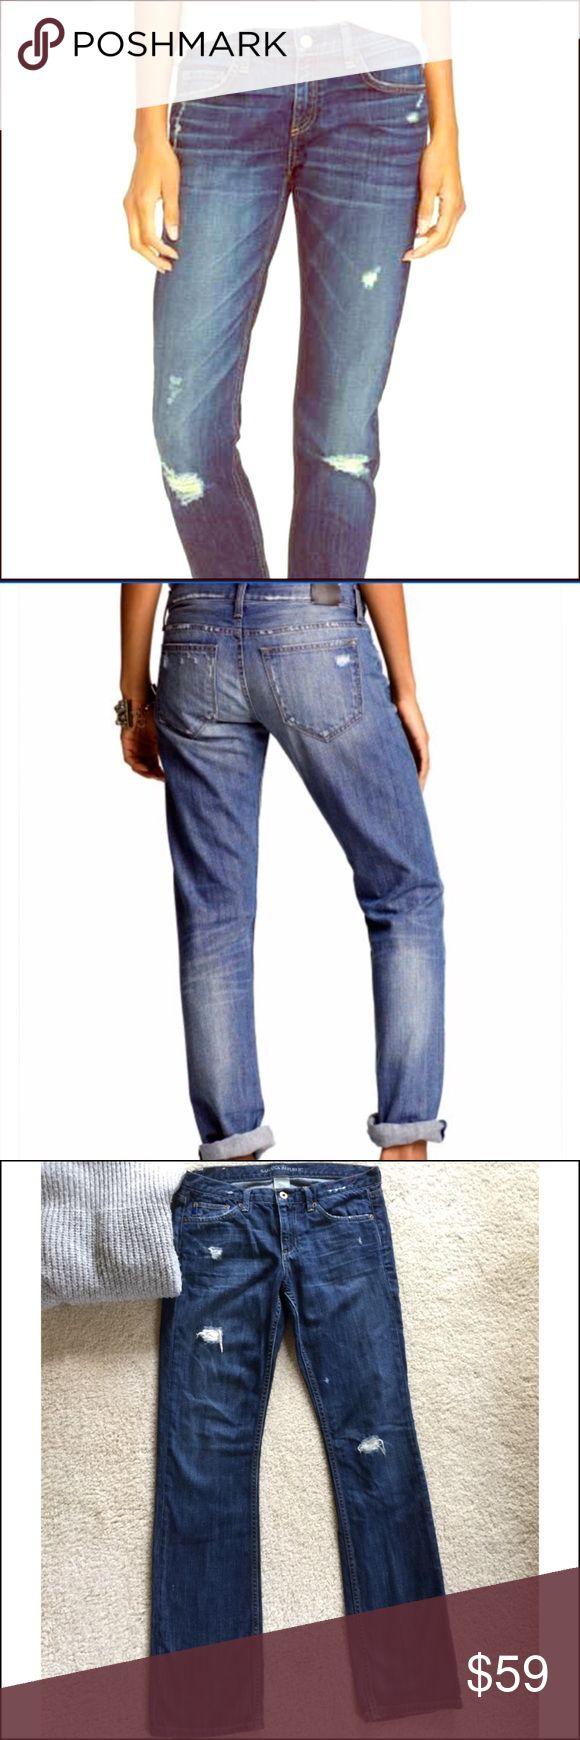 25  best ideas about Best boyfriend jeans on Pinterest   Summer ...